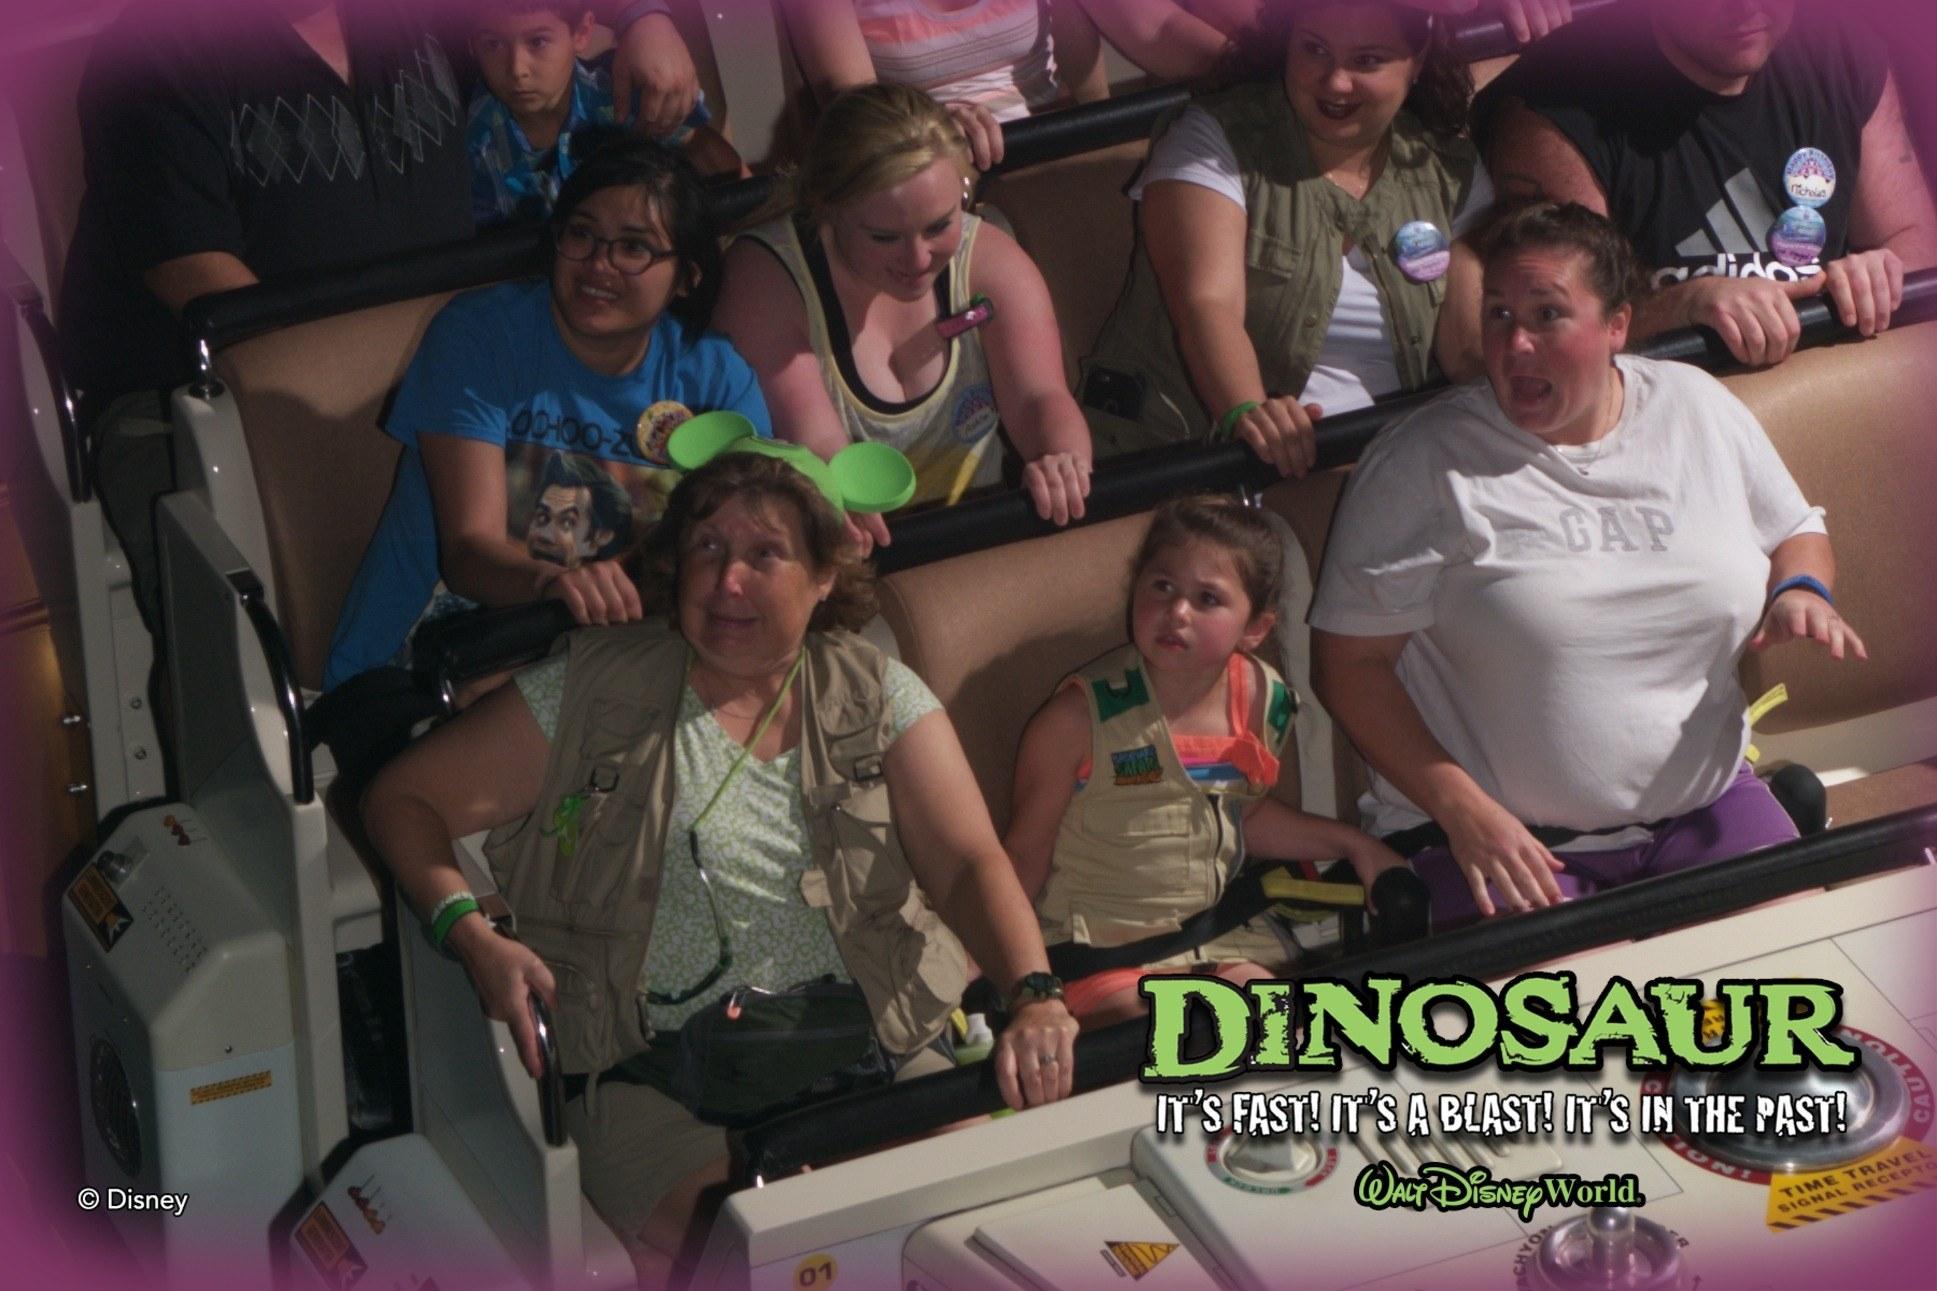 Dinosaur ride car at Animal Kingdom in Disney World